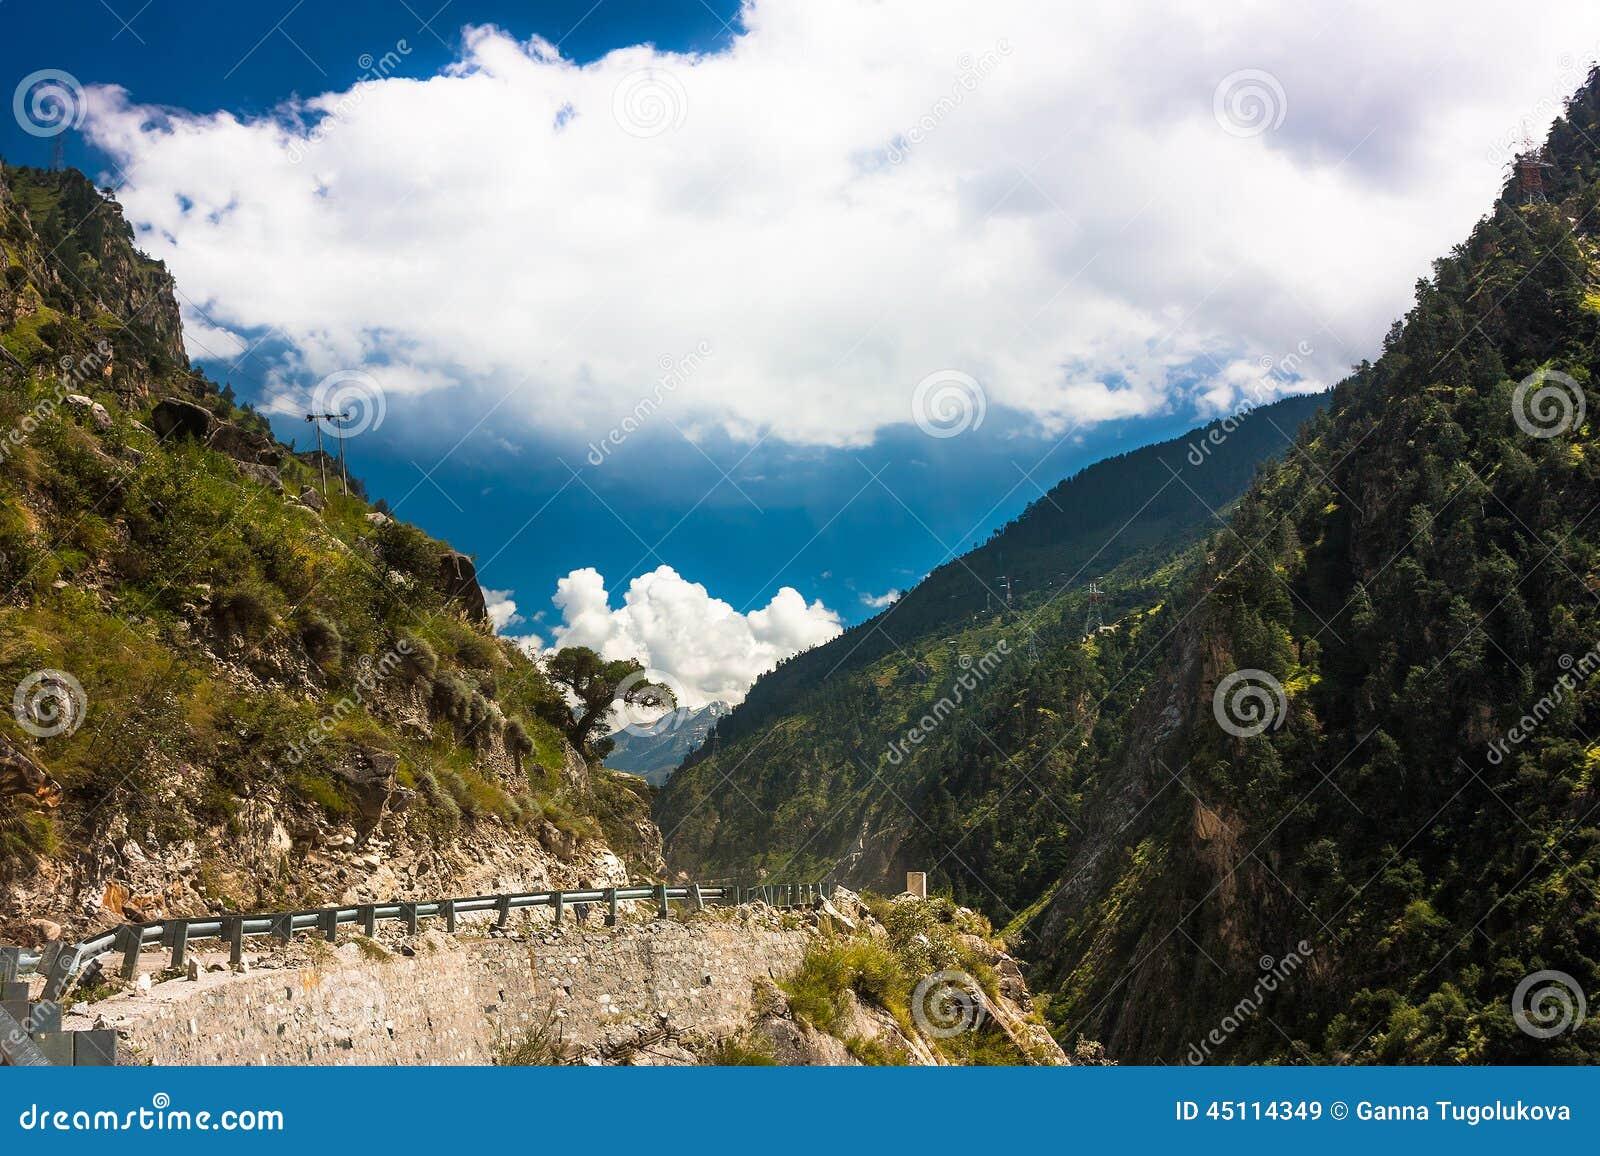 manali-leh路在印地安喜马拉雅山,查谟和克什米尔状态,北部印度.